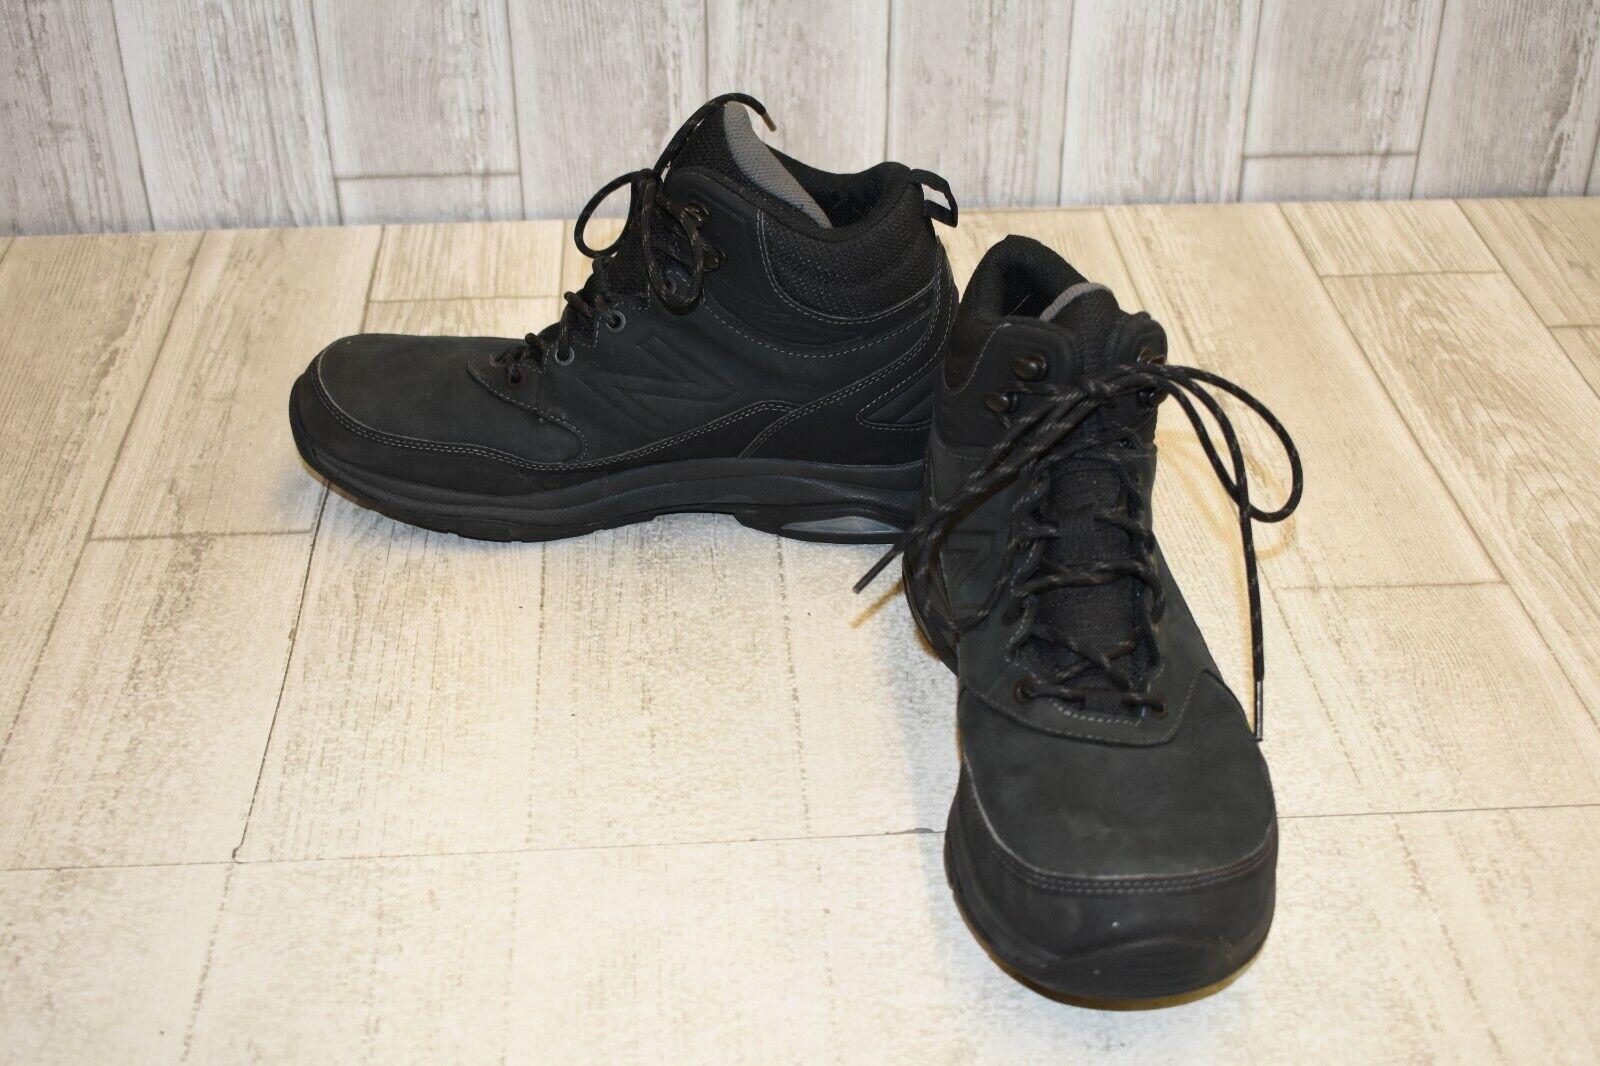 +New Balance 1400v1 Hiking Boot - Men's Size 11B, Black